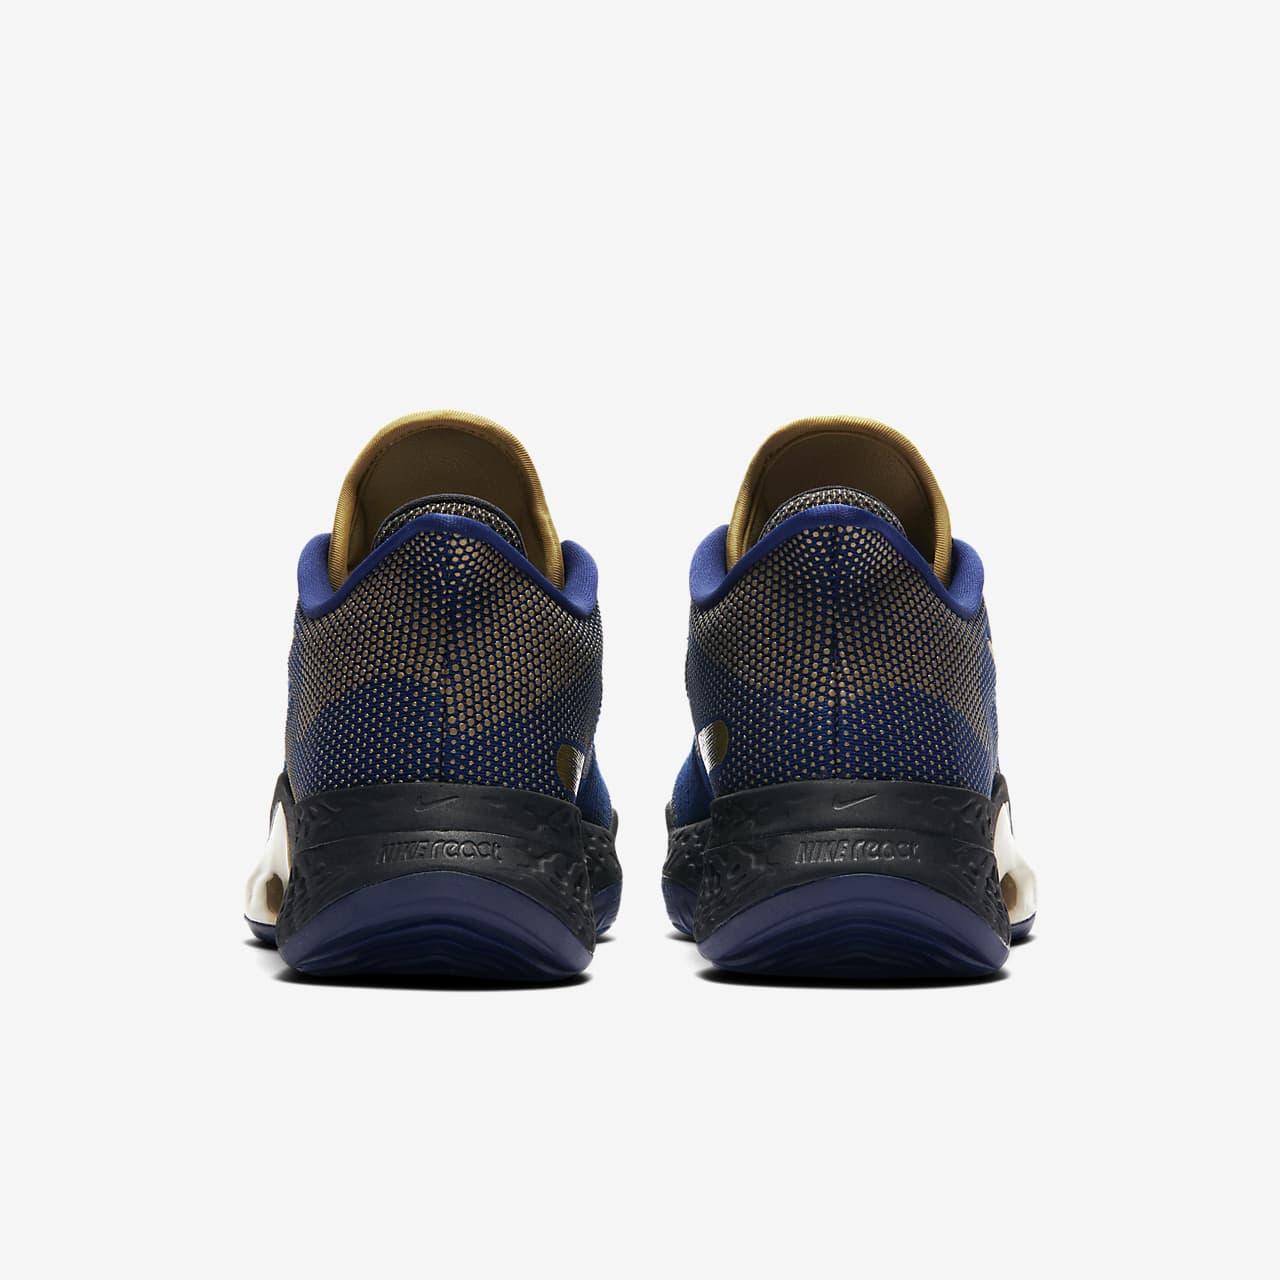 Nike Air Zoom BB NXT Basketball Shoe CK5707-400